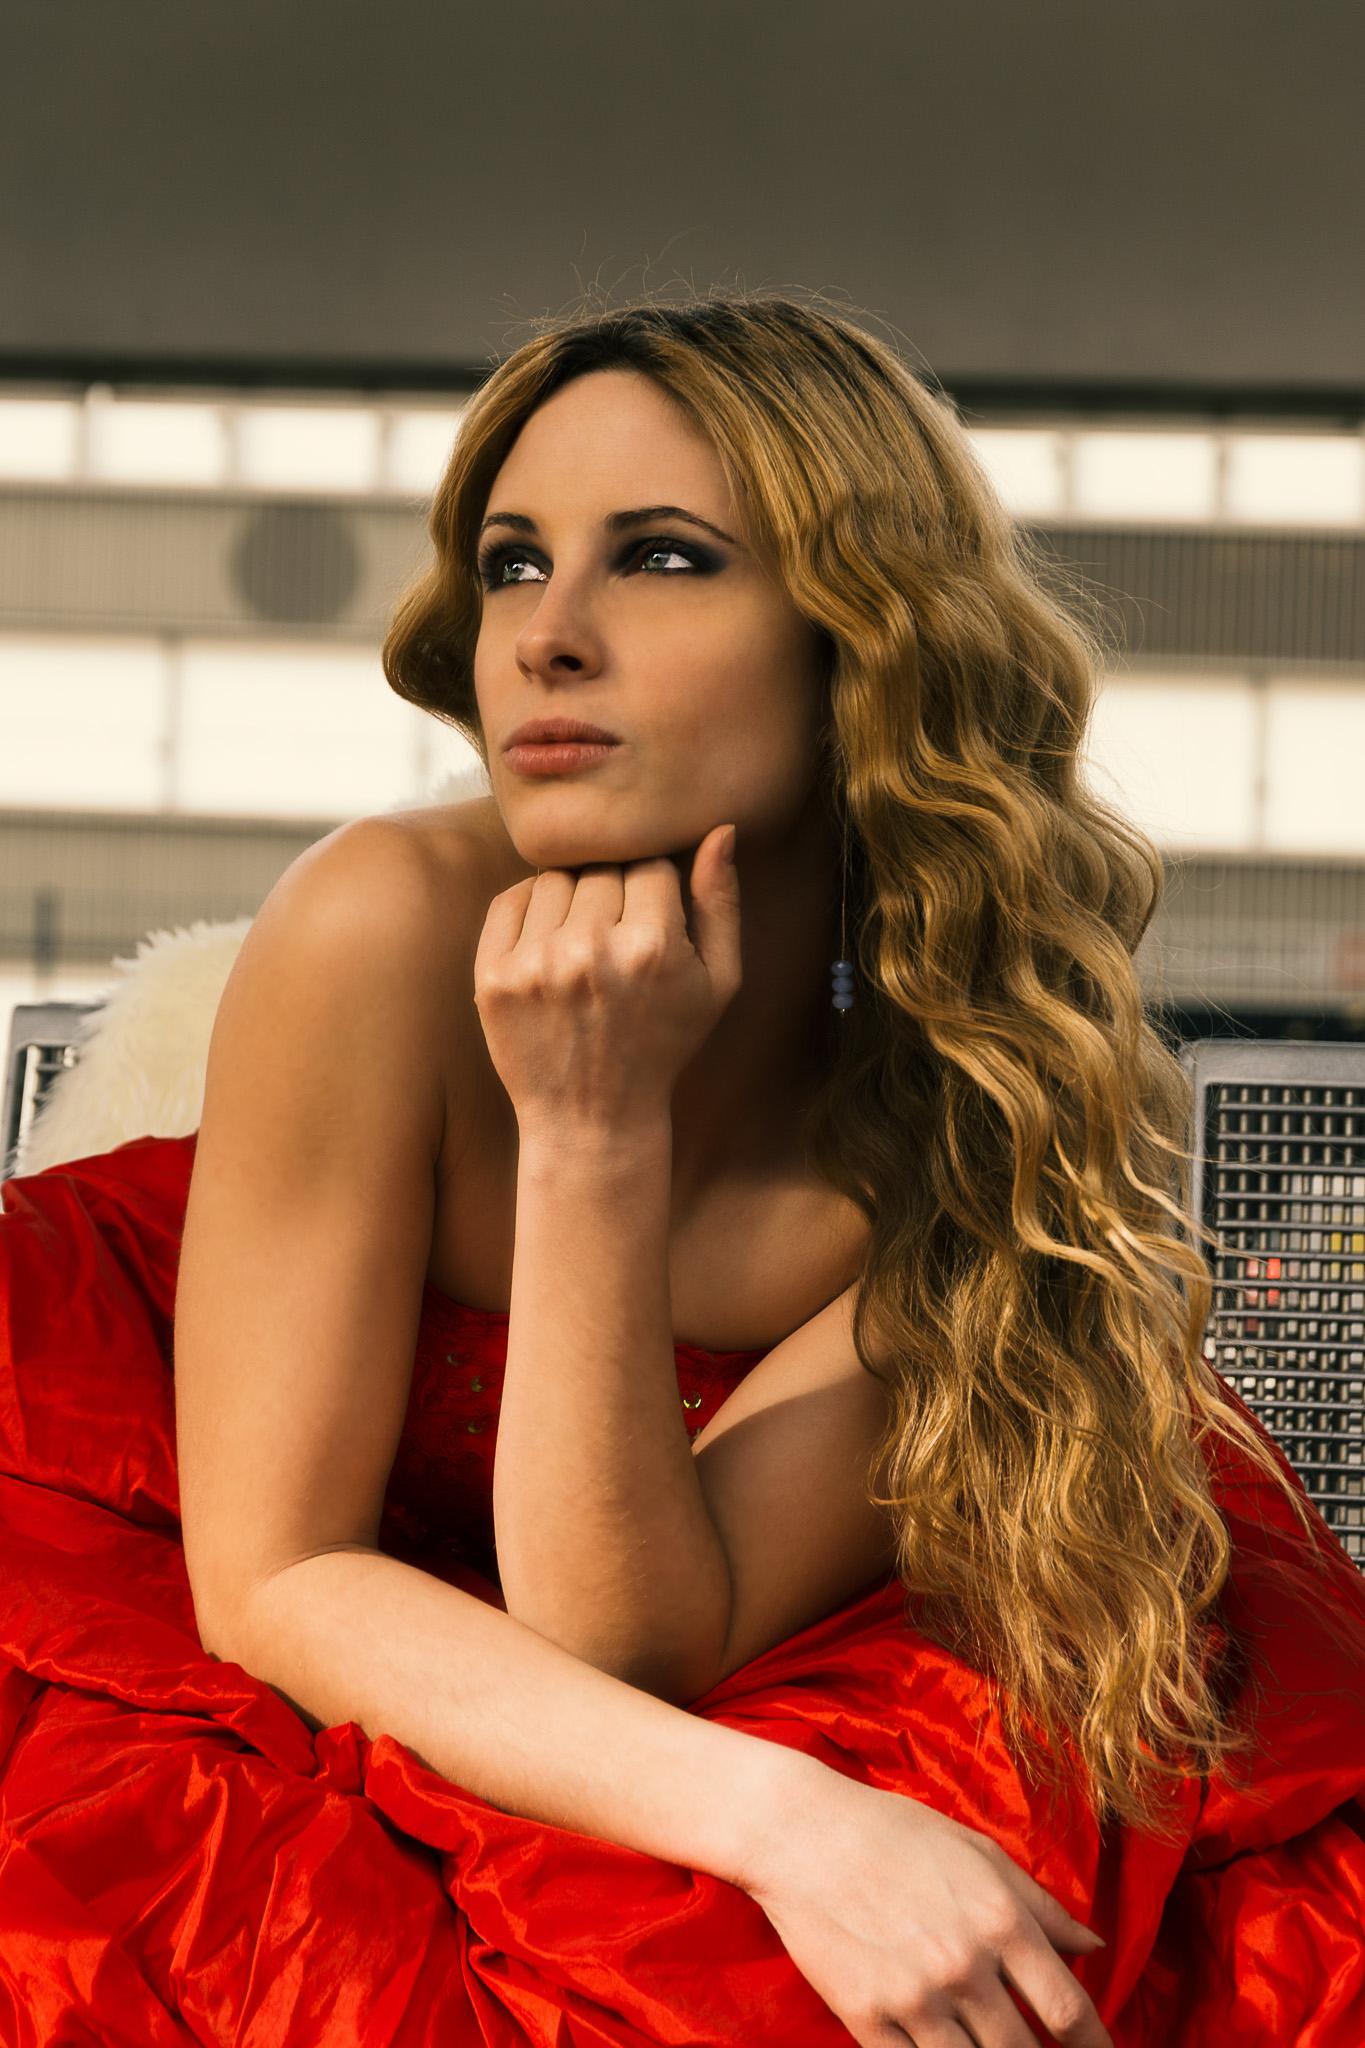 Melanie Melchior